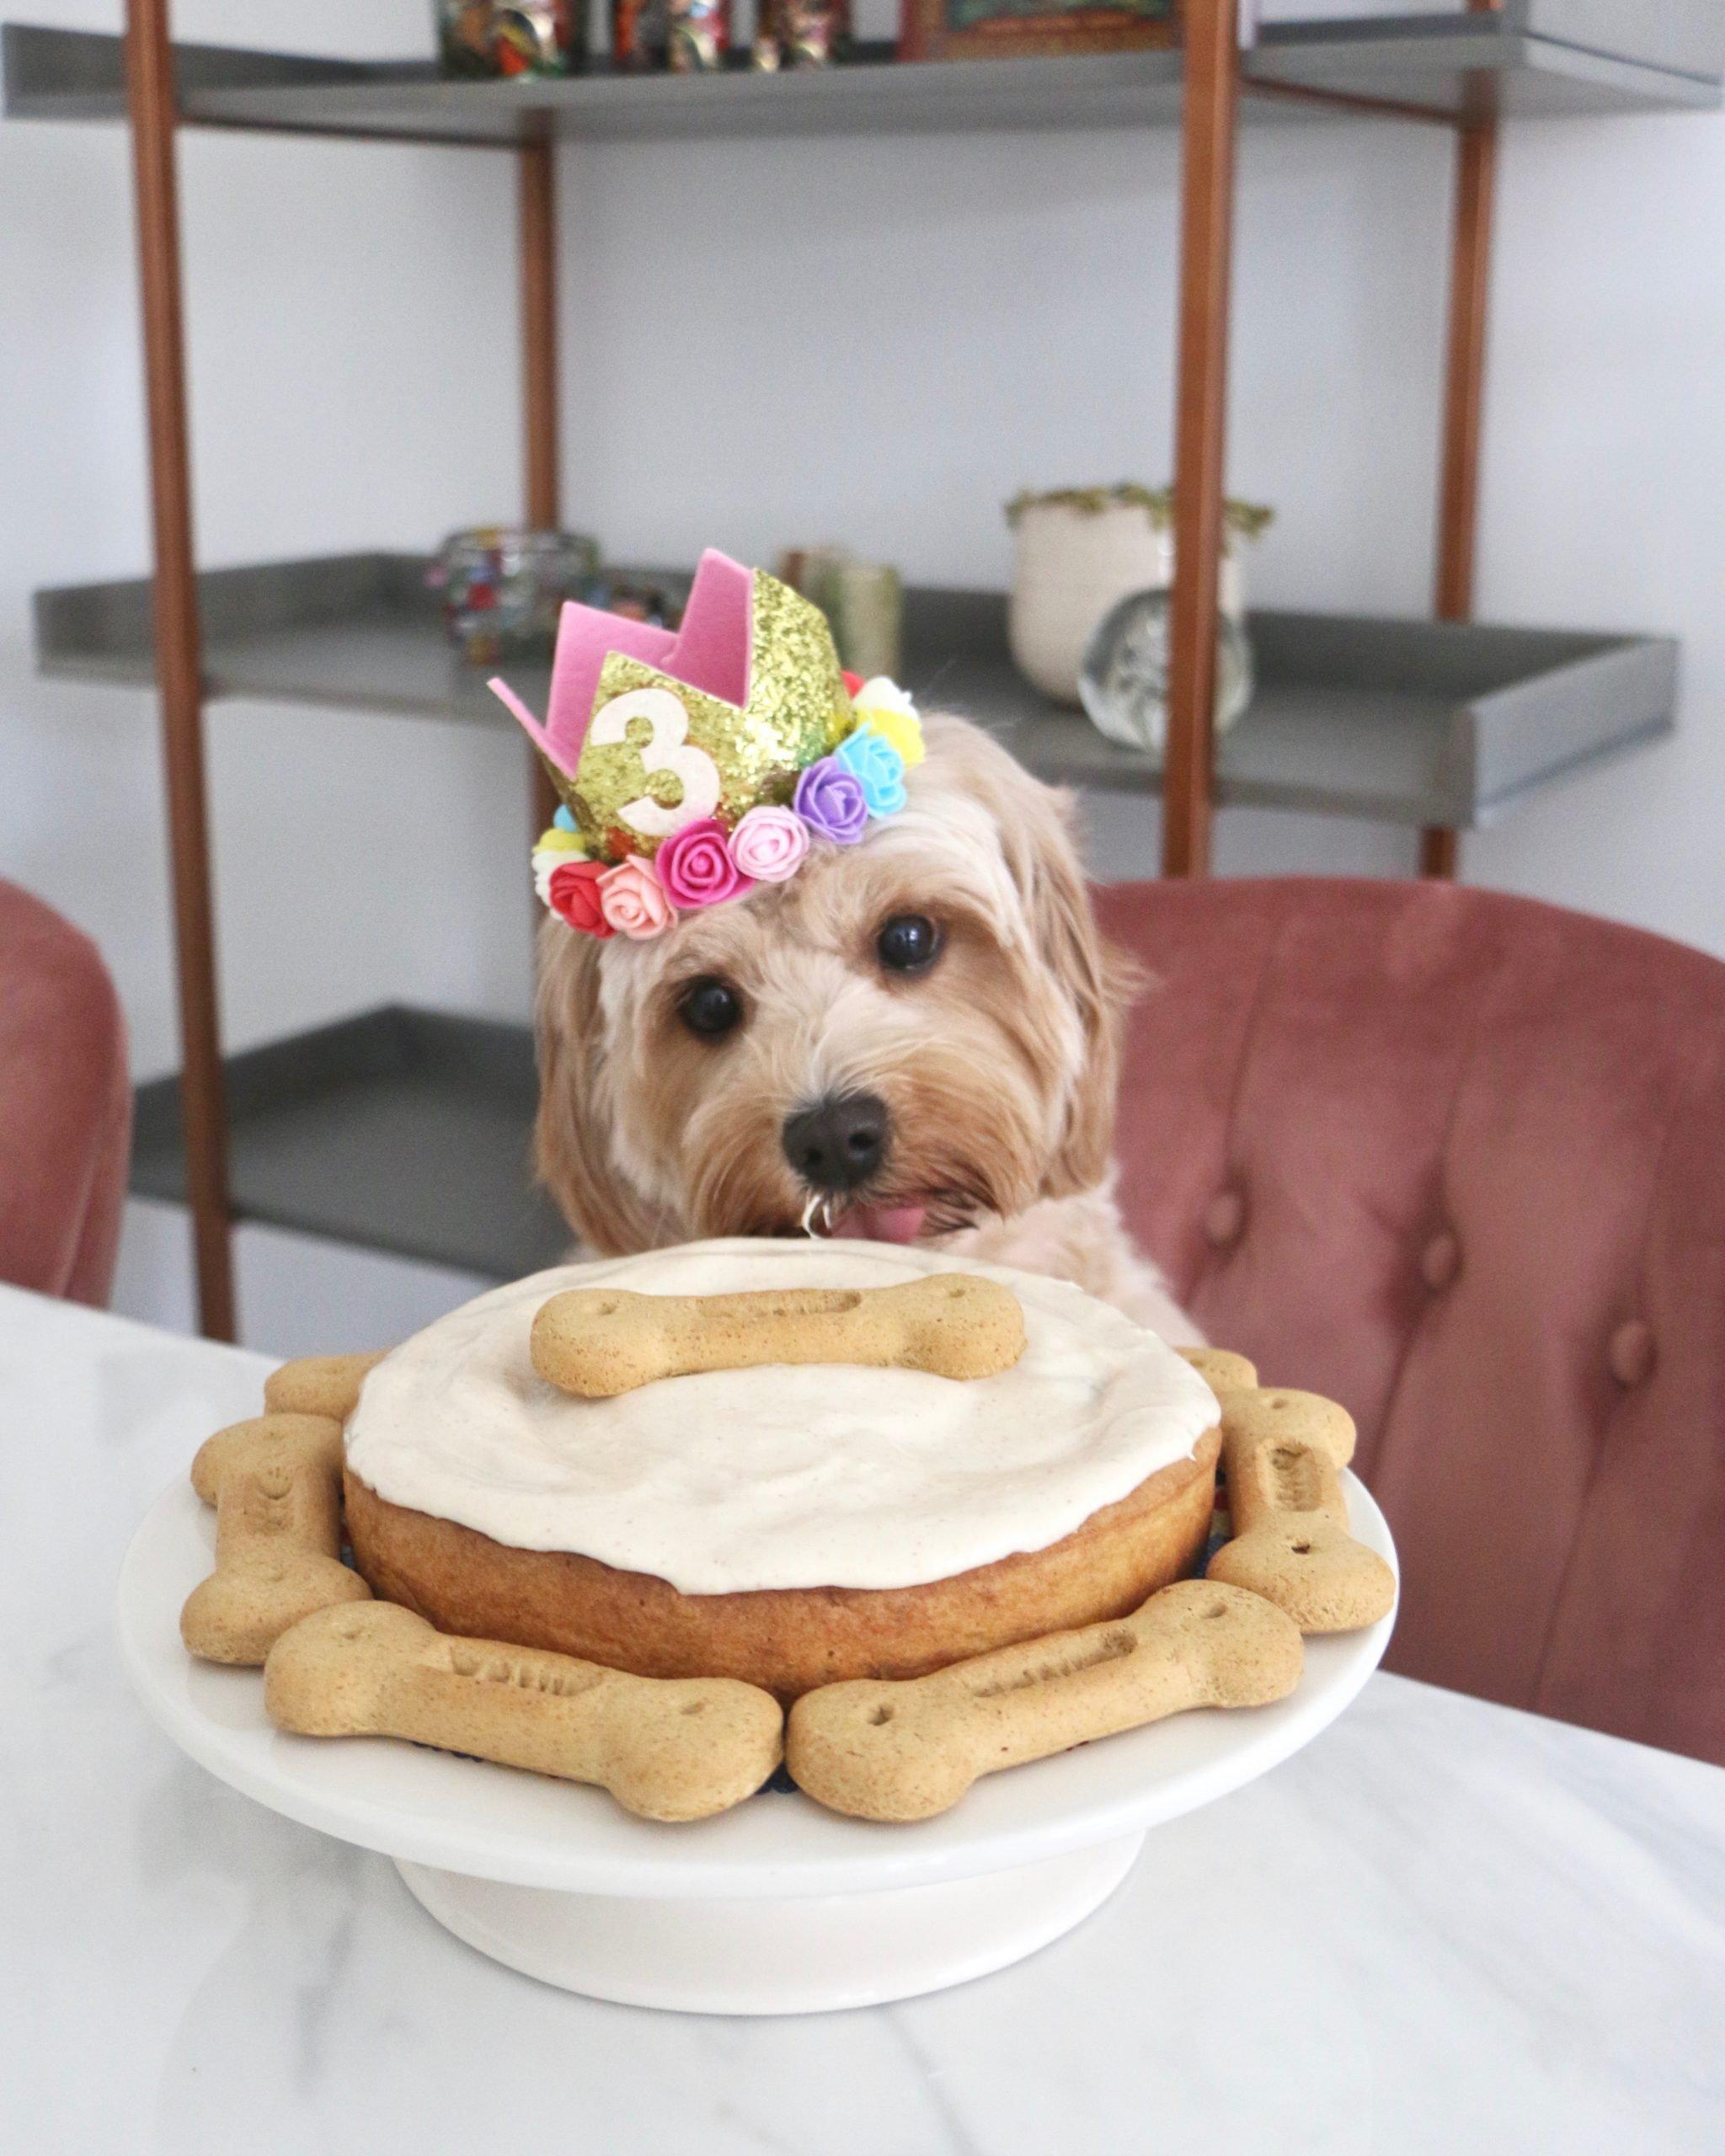 Superb Dog Birthday Cake Recipe Banana Peanut Butter Funny Birthday Cards Online Hendilapandamsfinfo